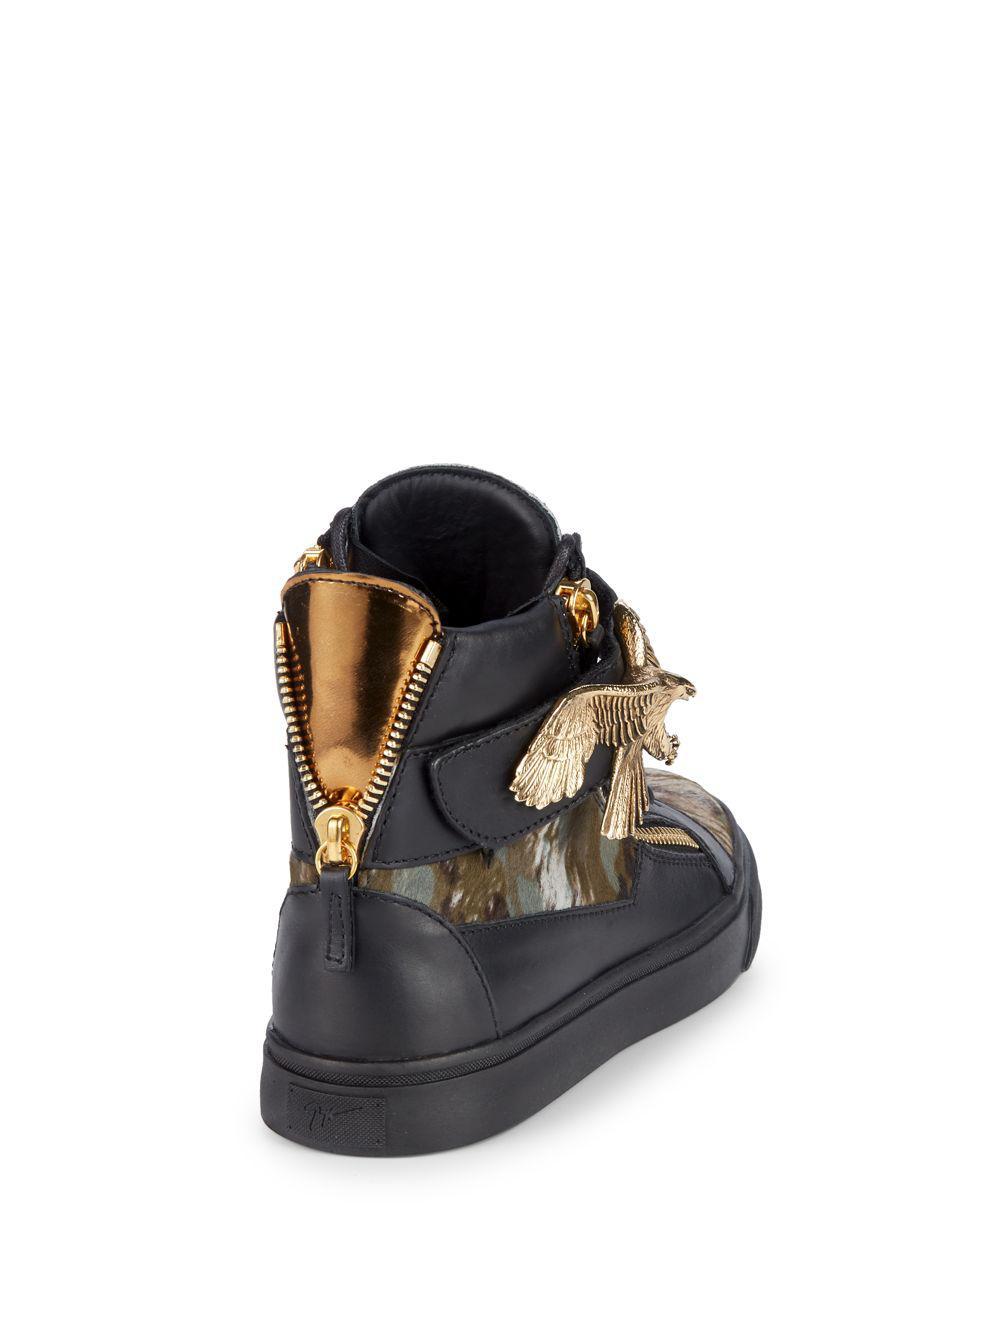 52483110c5810 Giuseppe Zanotti Camo Print High-top Sneakers in Black for Men - Lyst